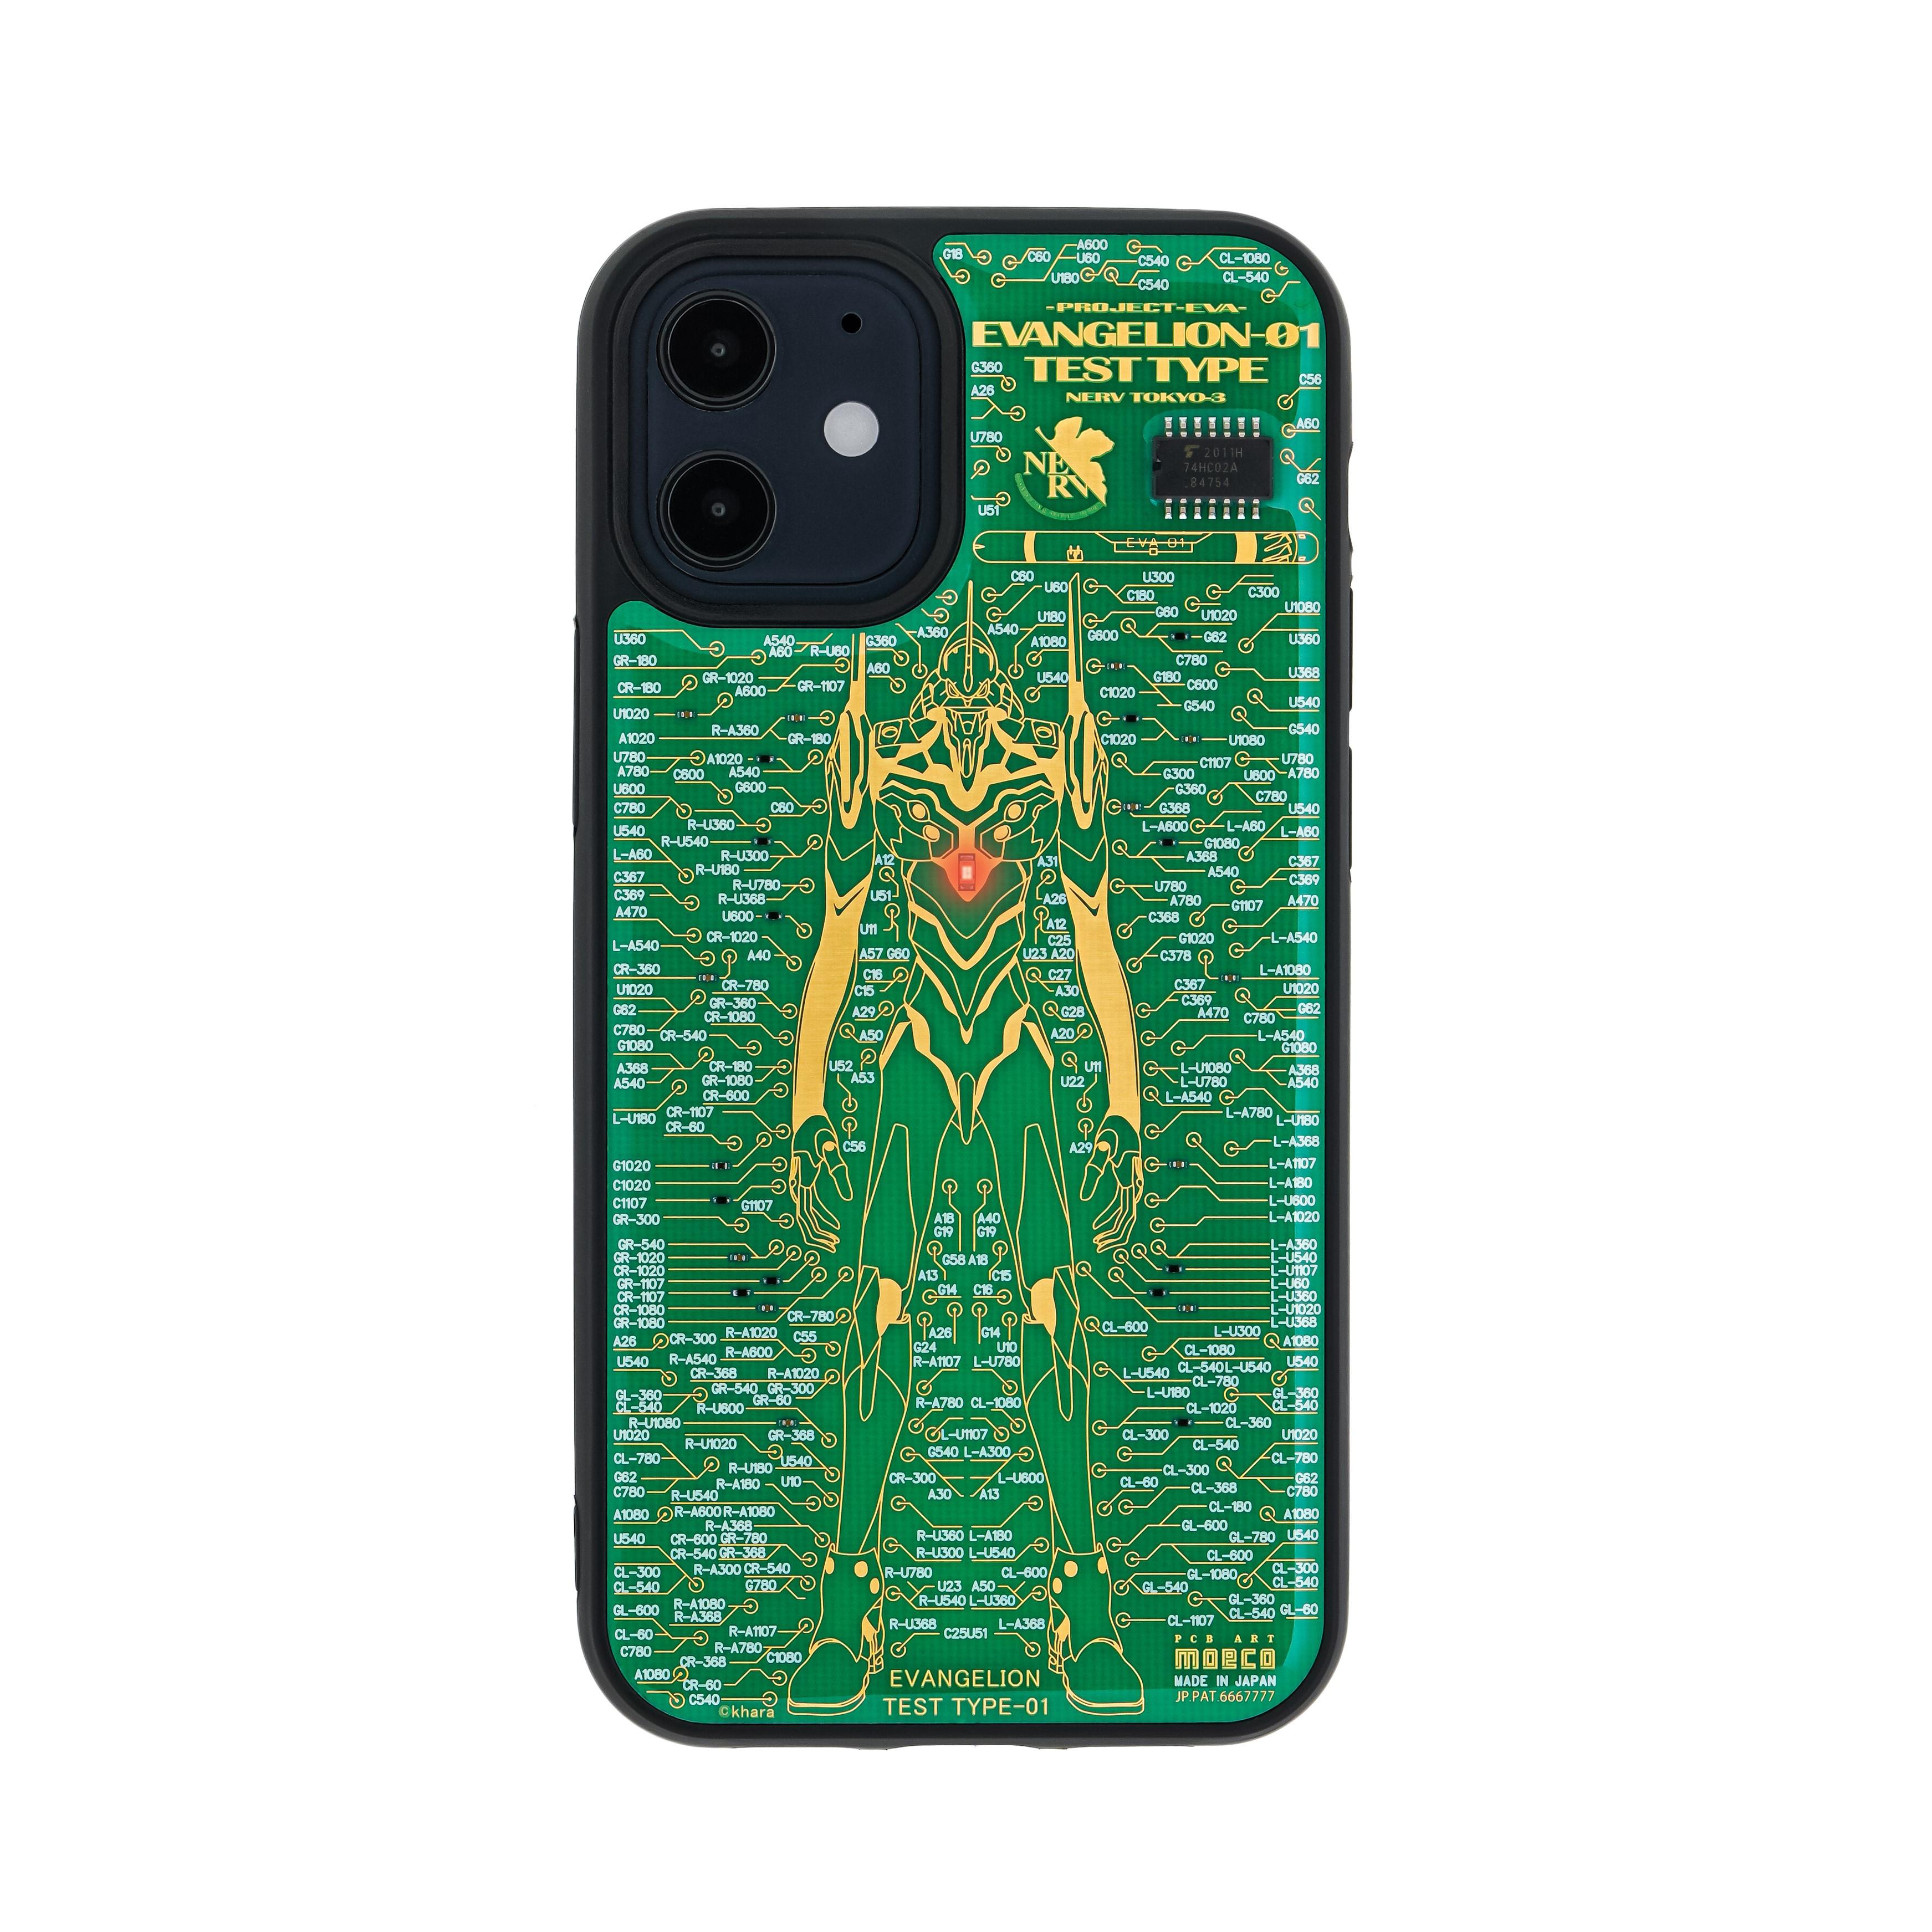 FLASH EVA01 基板アート iPhone 12 mini ケース 緑【東京回路線図A5クリアファイルをプレゼント】